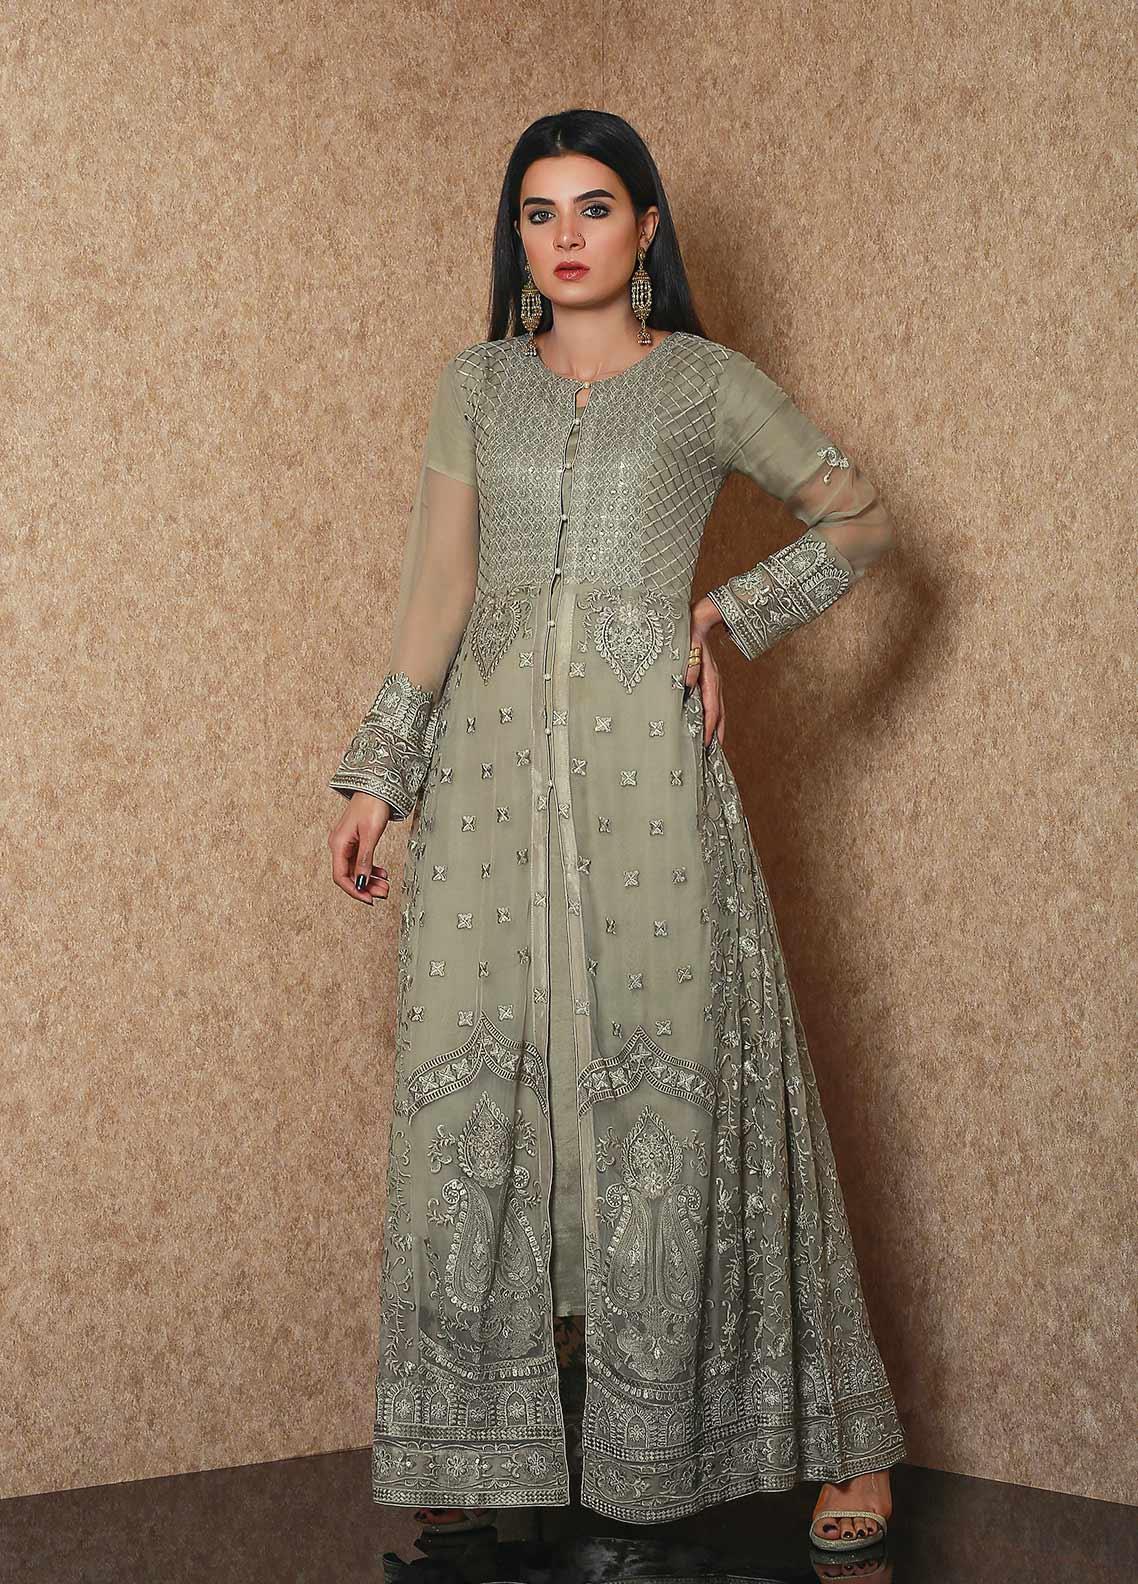 Spade Luxury Chiffon Stitched Gown C9DGC-12 DEEP GREEN